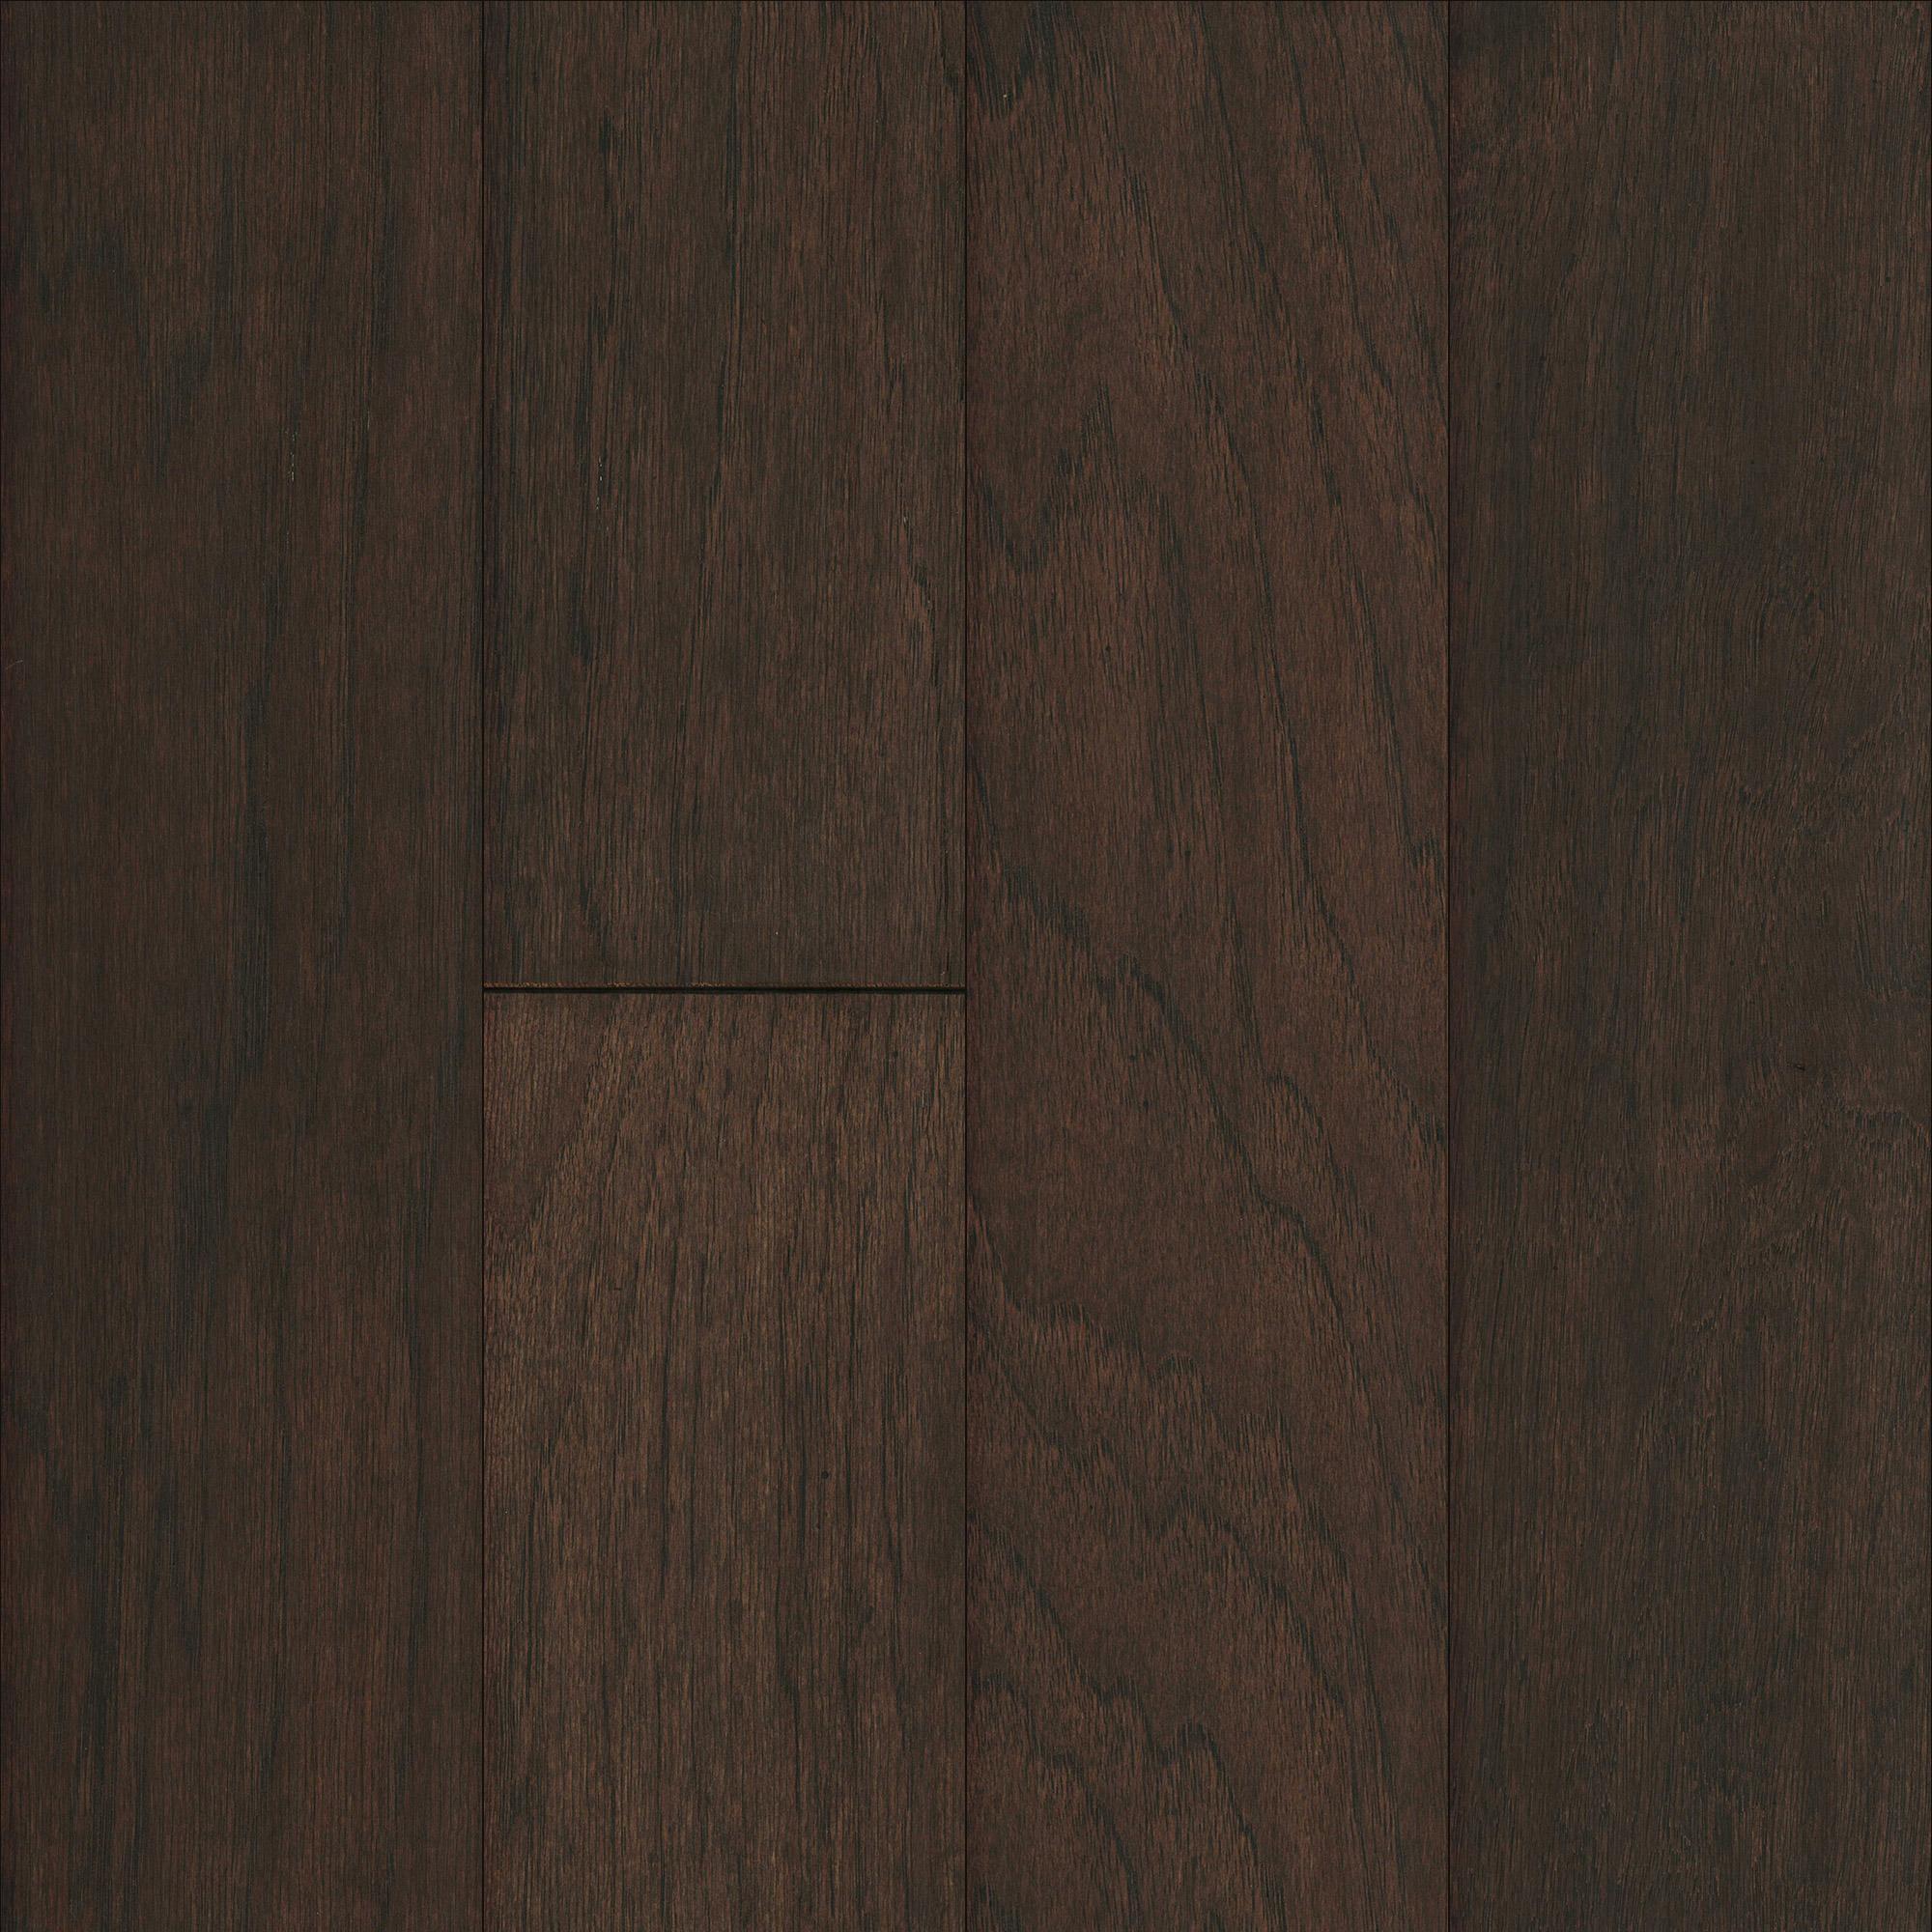 Hardwood Flooring Engineered Vs solid Cost Of Mullican Devonshire Hickory Espresso 5 Engineered Hardwood Flooring Regarding Hickory Espresso 5 X 40 2000 A